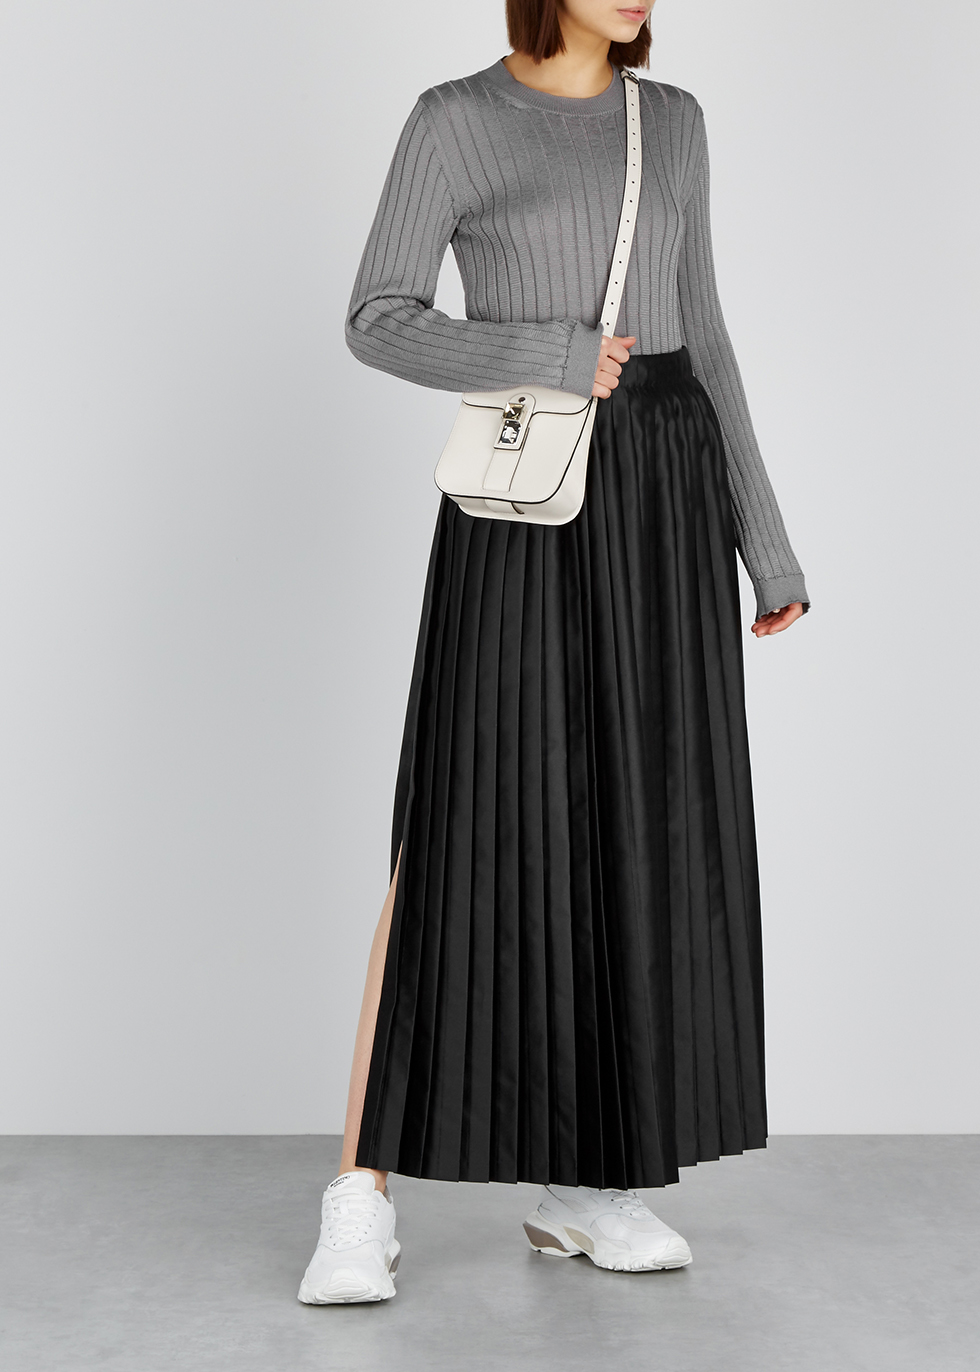 Black pleated satin wrap skirt - MM6 by Maison Margiela